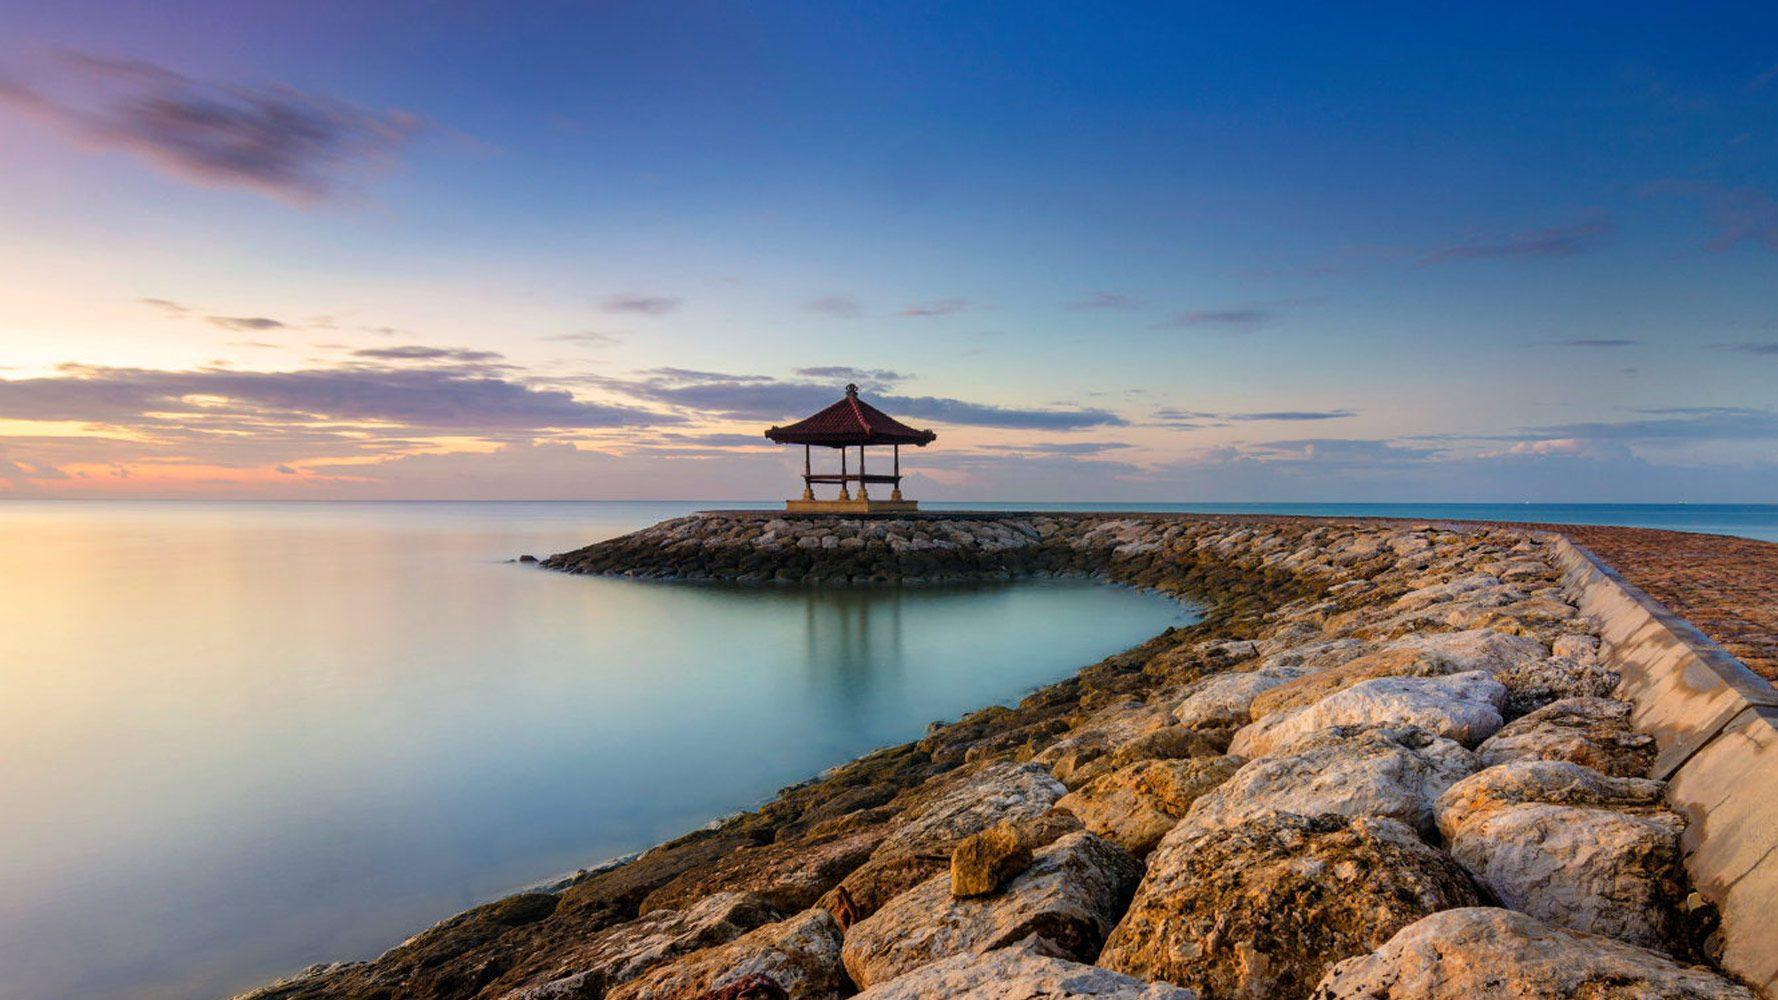 Пляж Санур на Бали: обзор